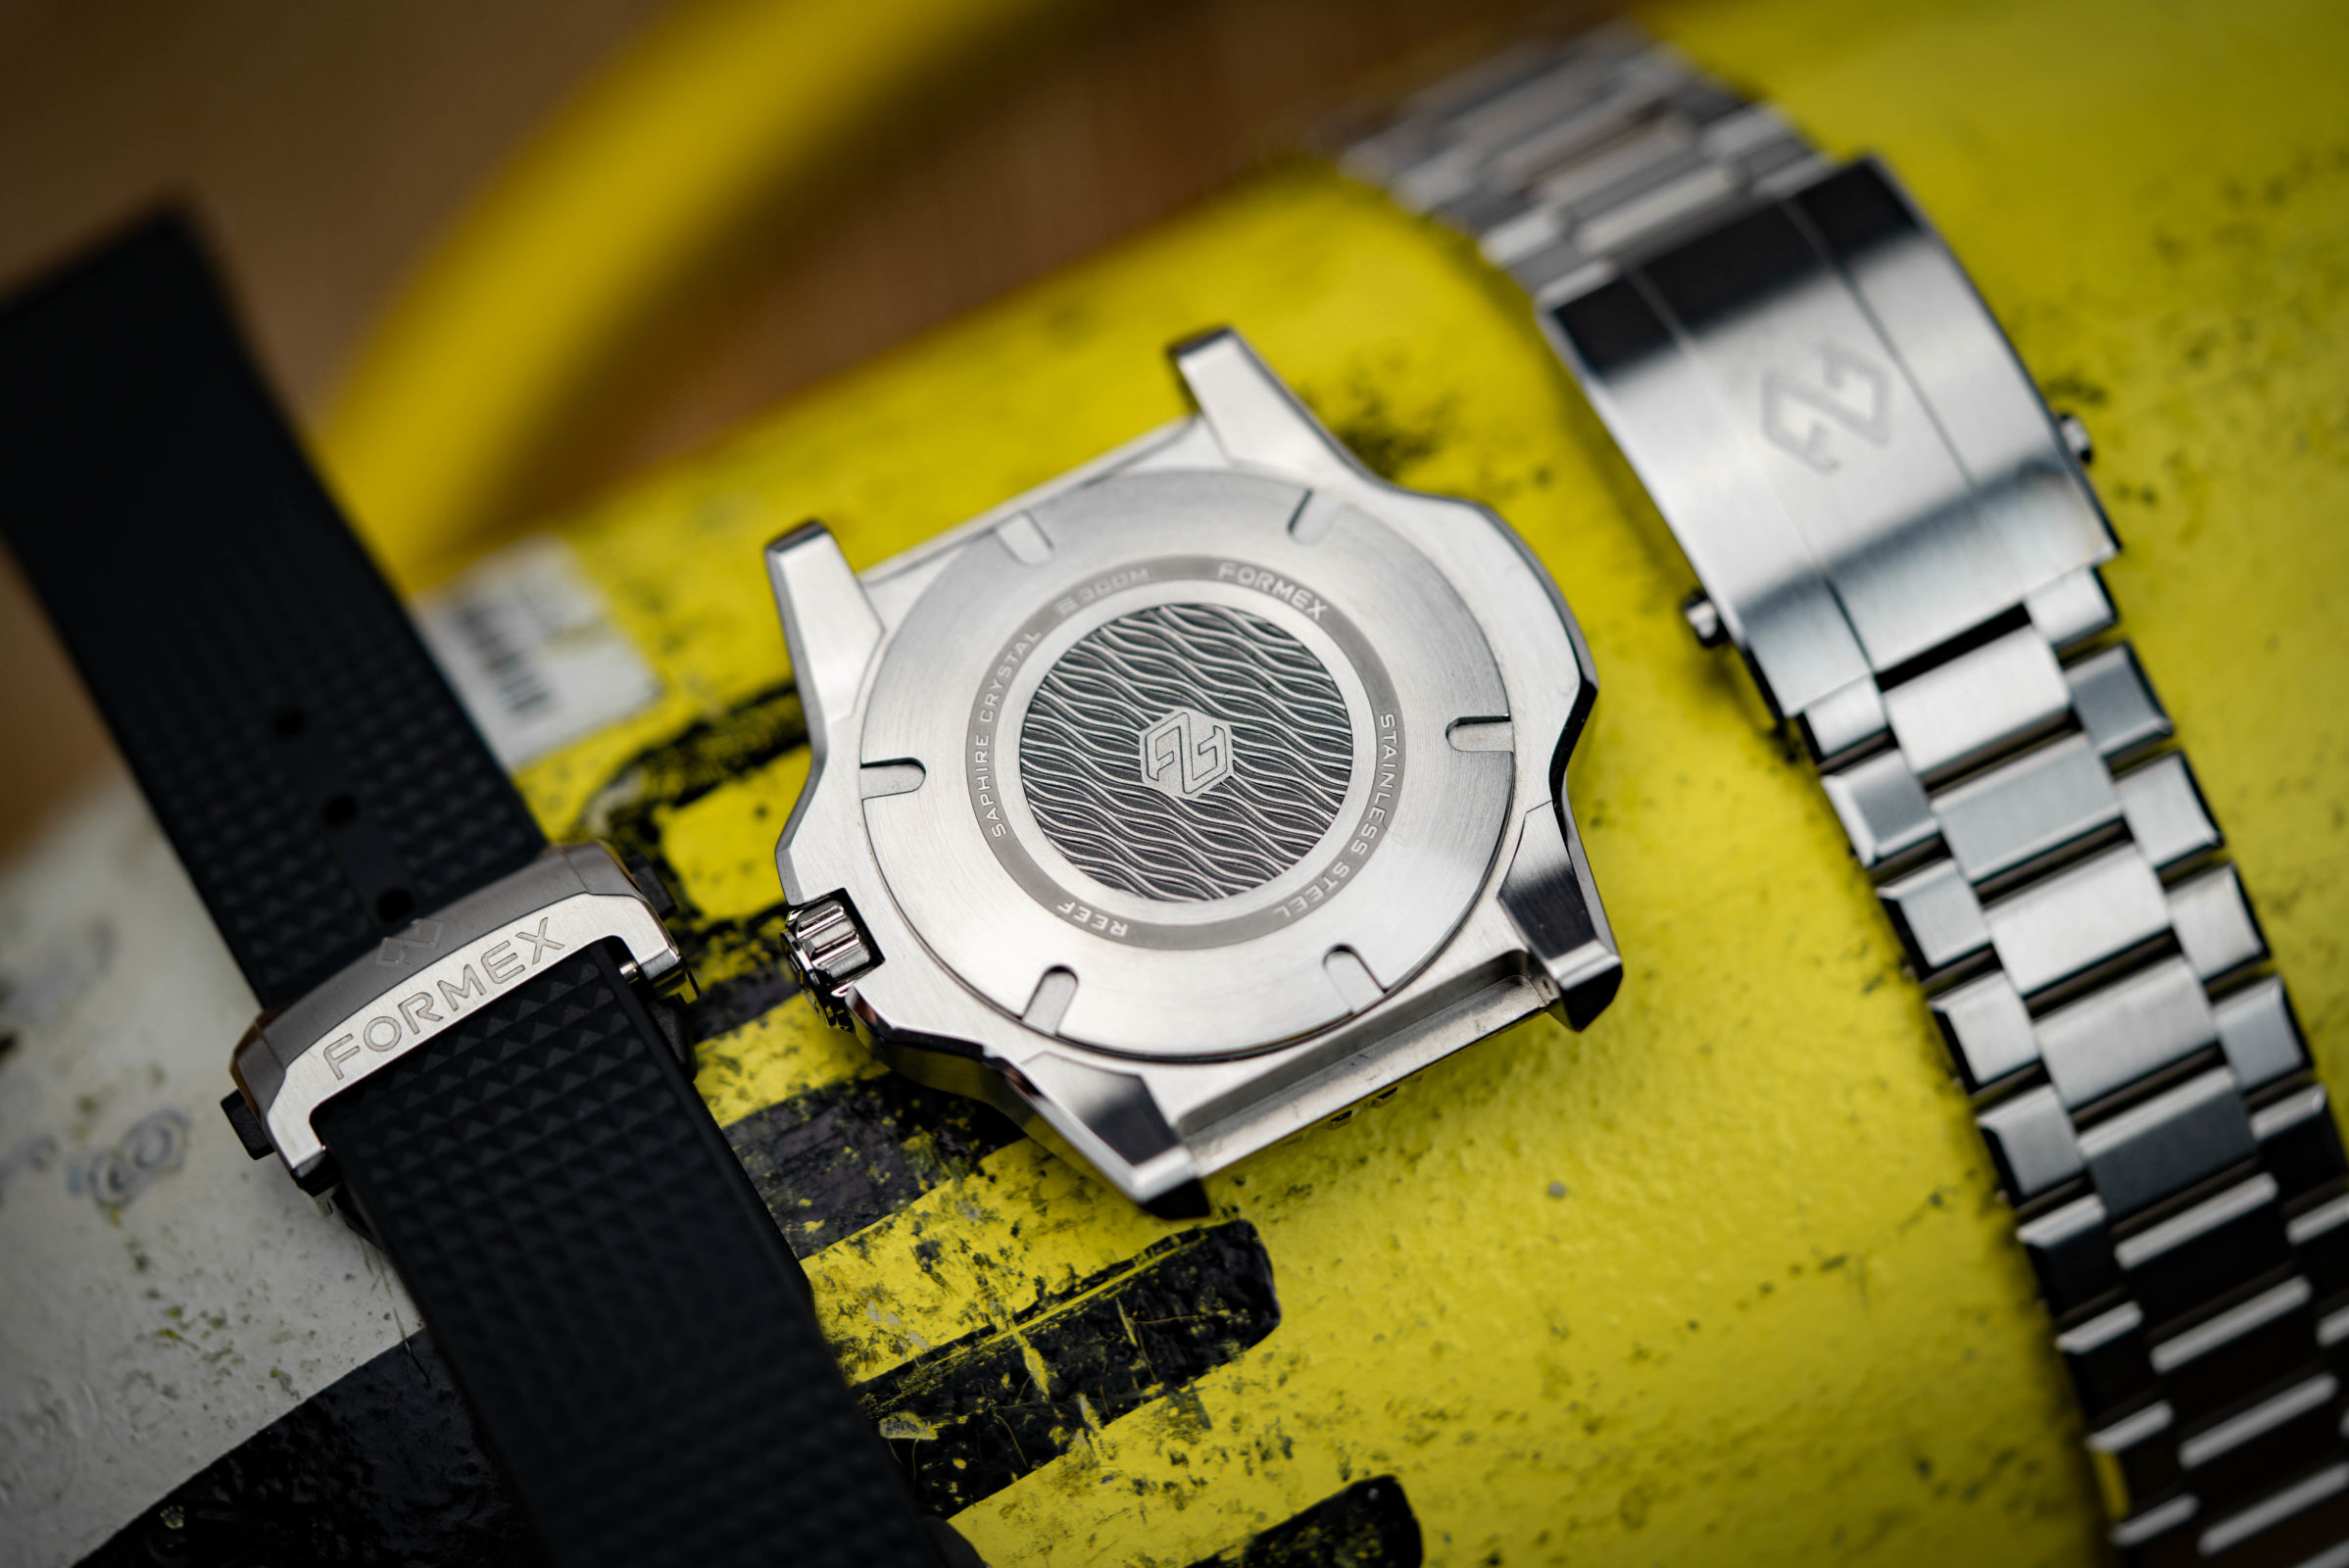 Formex-Reef-Automatik-Chronometer-300m-27